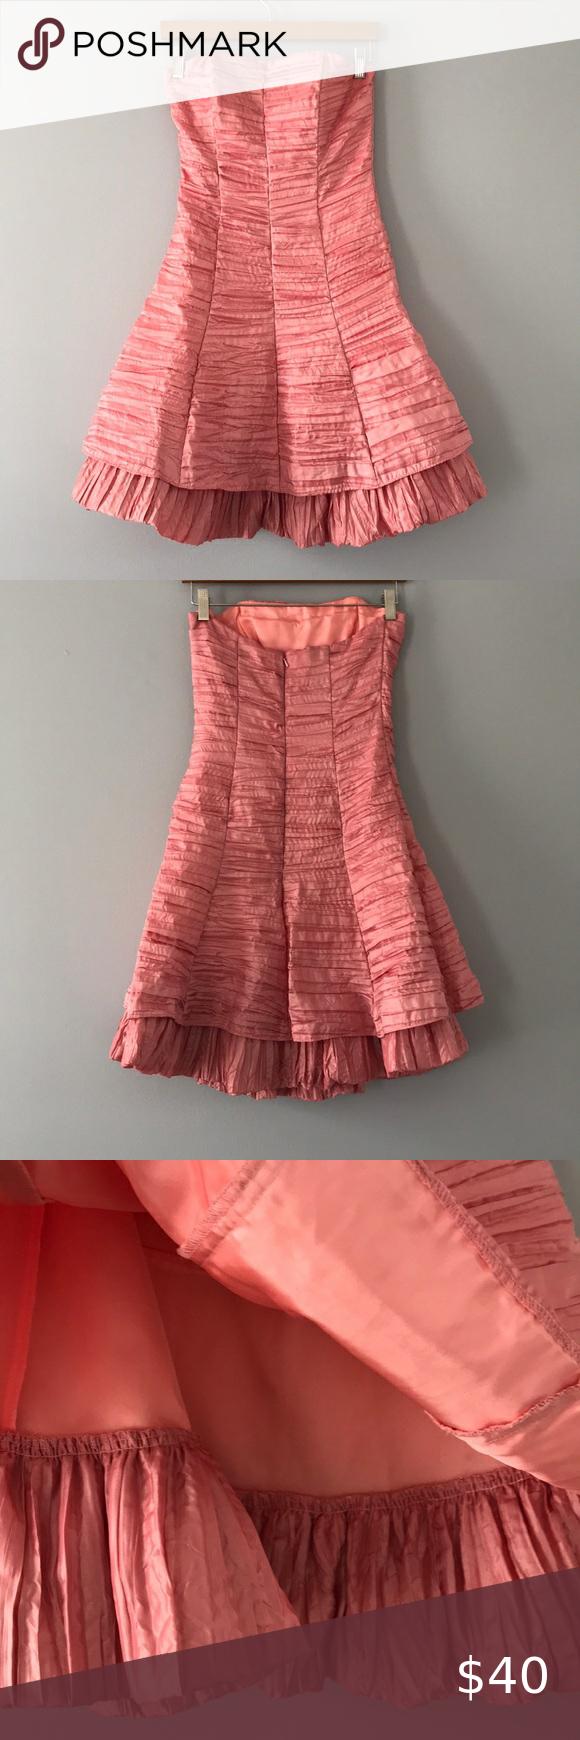 Jessica Mcclintock Vintage Ruffle Cocktail Dress Fit And Flare Dress Strapless Ruffle Dress Cocktail Dress [ 1740 x 580 Pixel ]